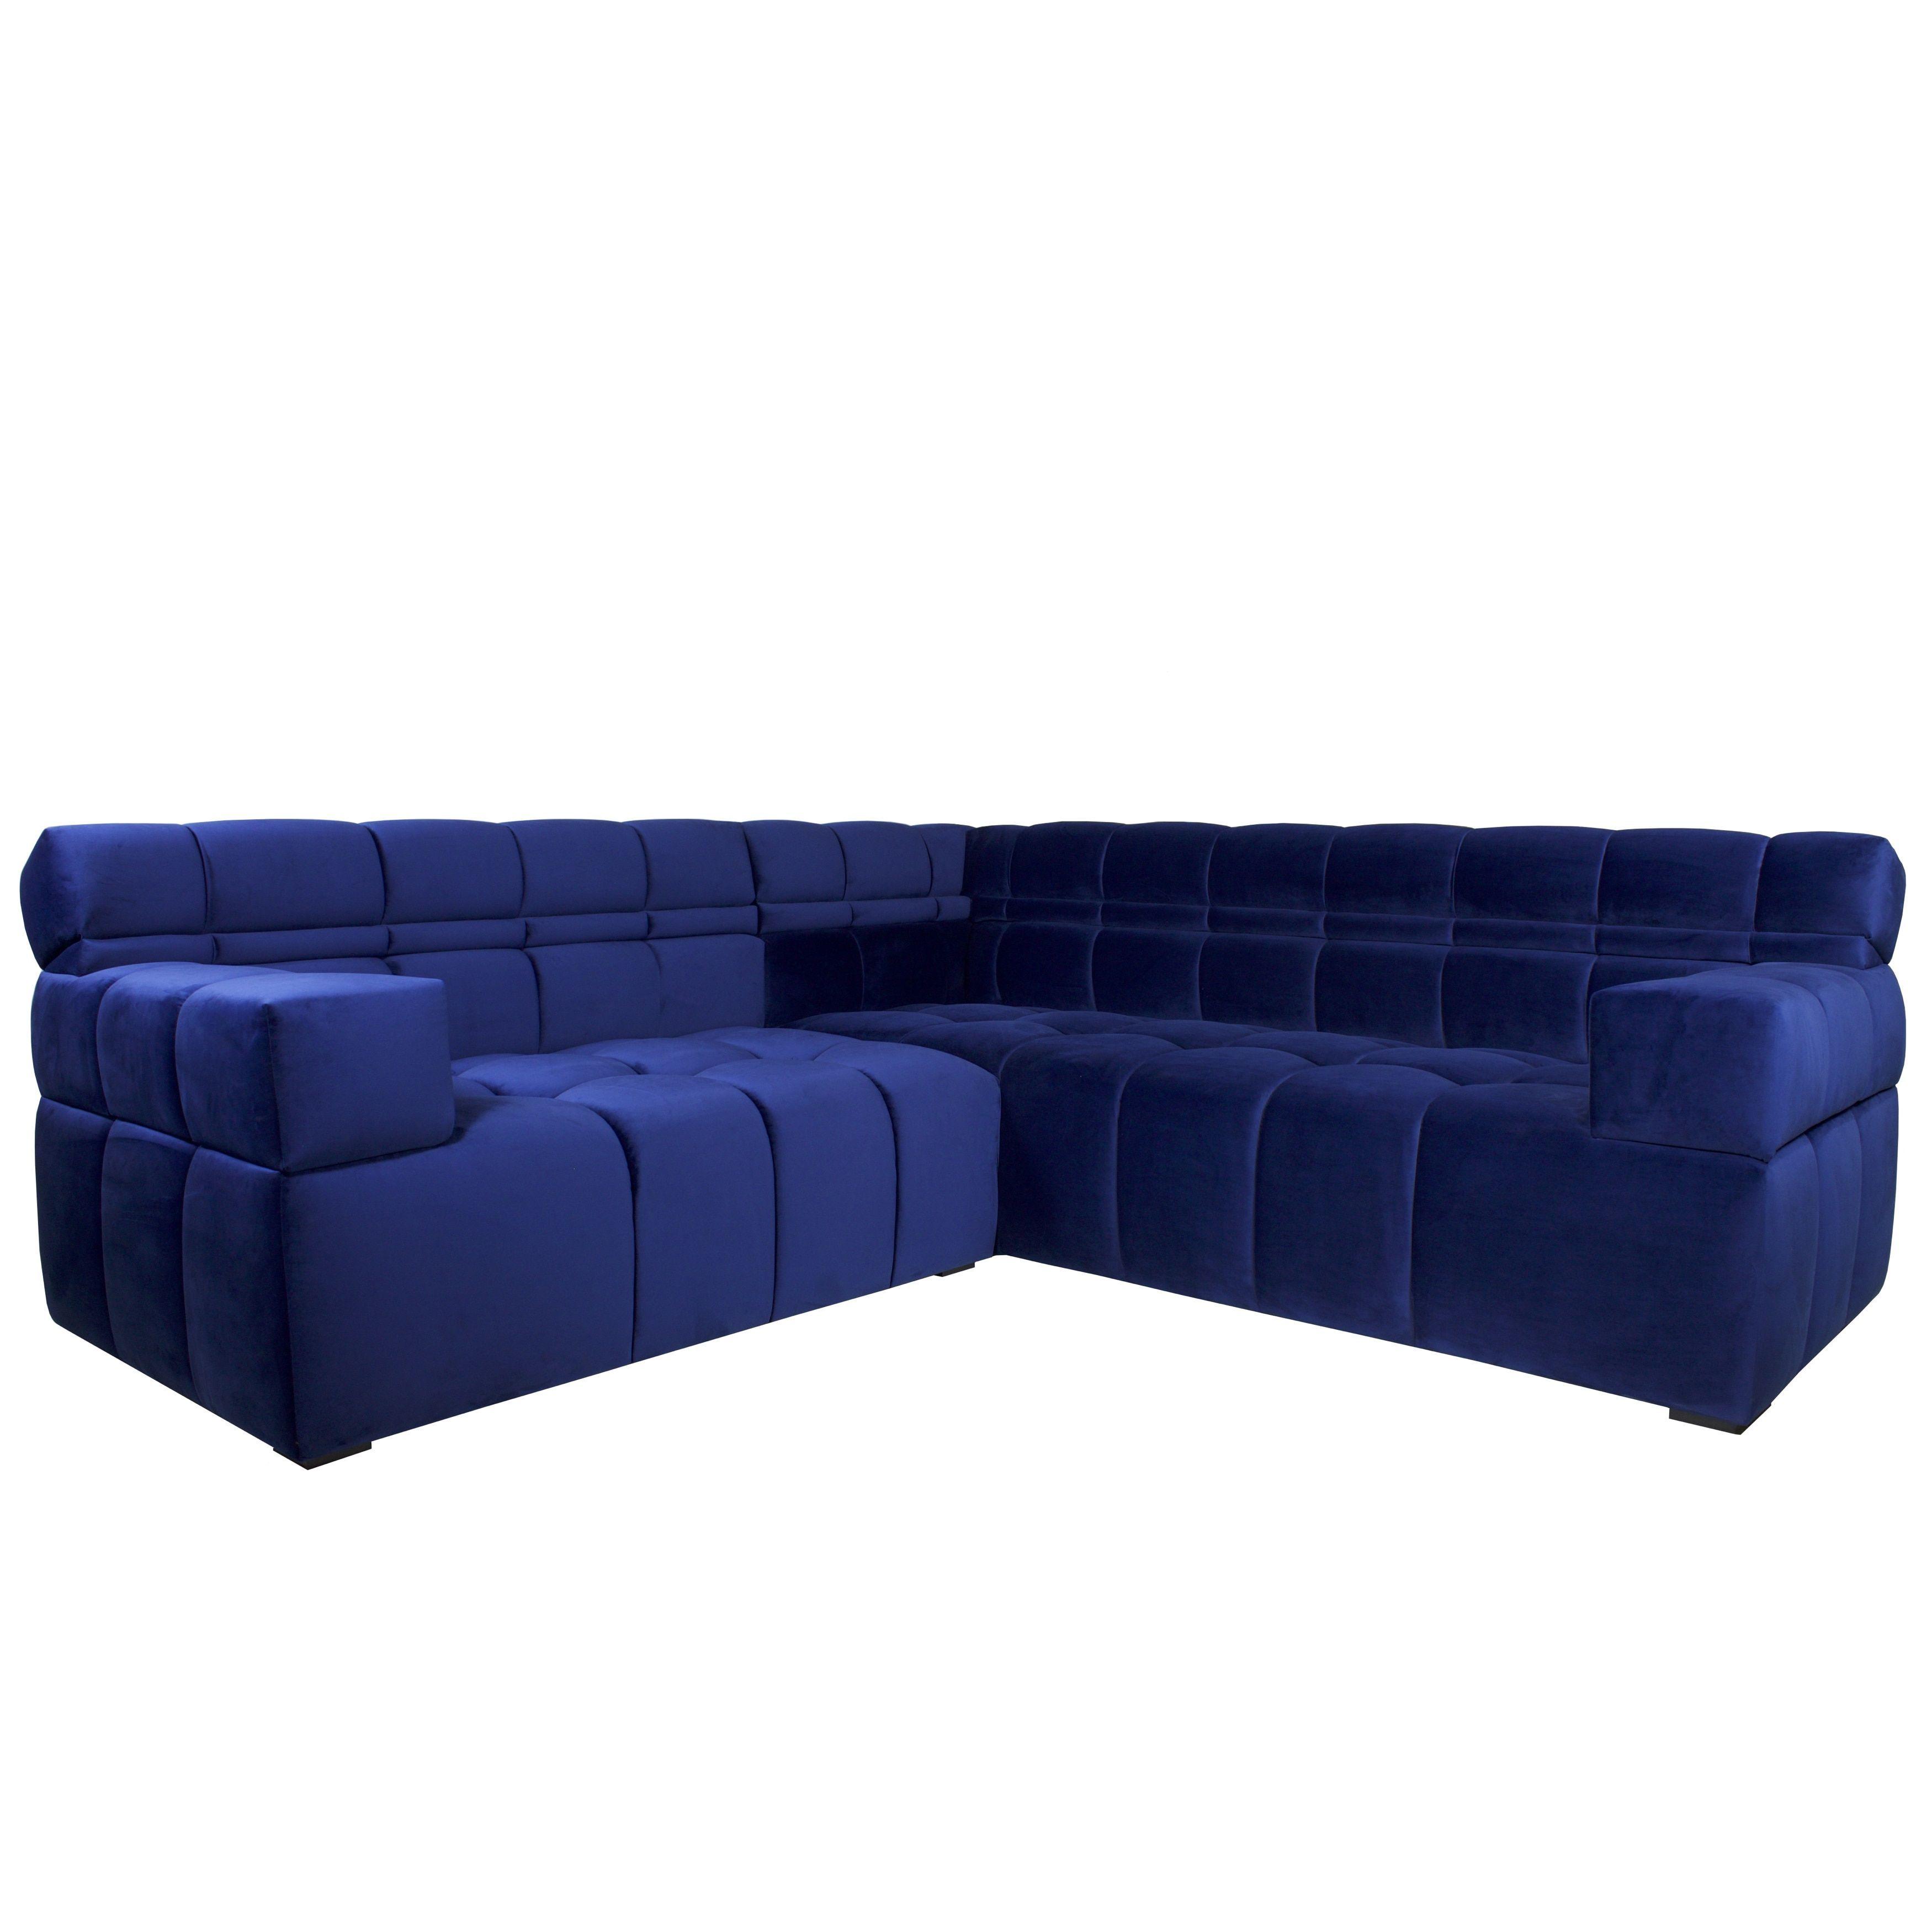 jar designs furniture. Exellent Furniture Overstockcom Online Shopping  Bedding Furniture Electronics Jewelry  Clothing U0026 More In Jar Designs Furniture